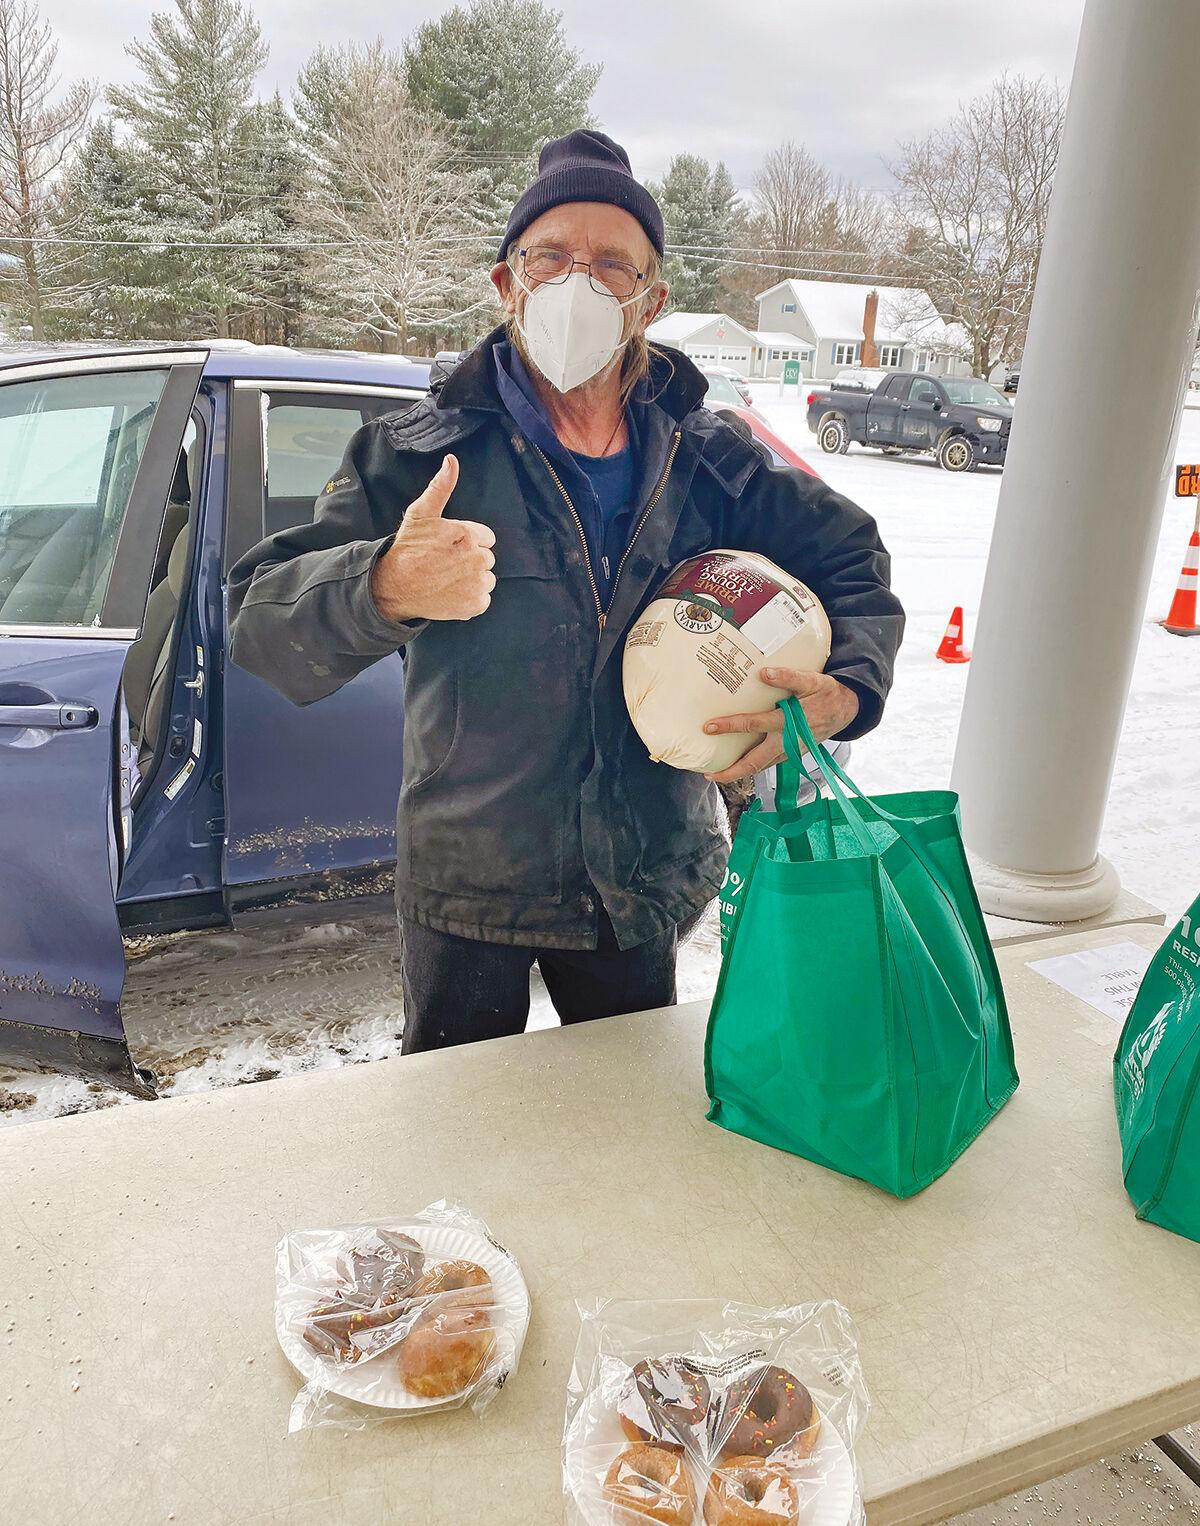 Food security: Larry Lathe